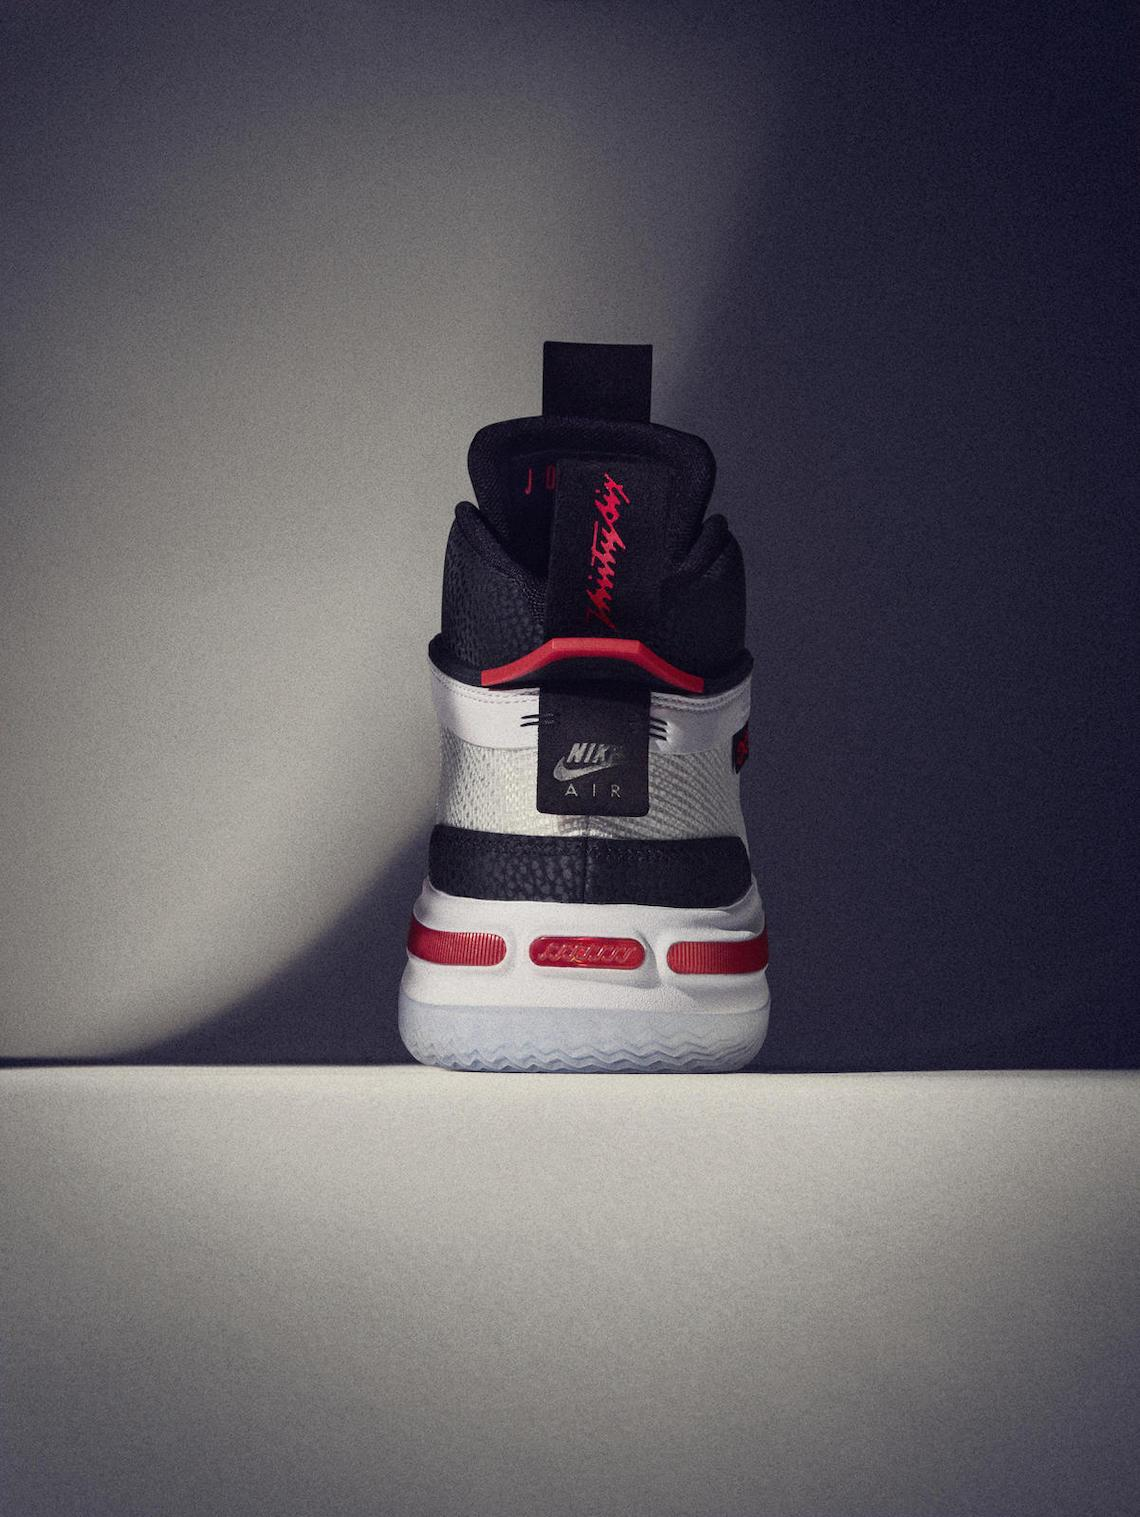 Air Jordan 36,AJ36,发售  AJ36 首轮配色完整曝光!多达 5 款 PE 即将发售!